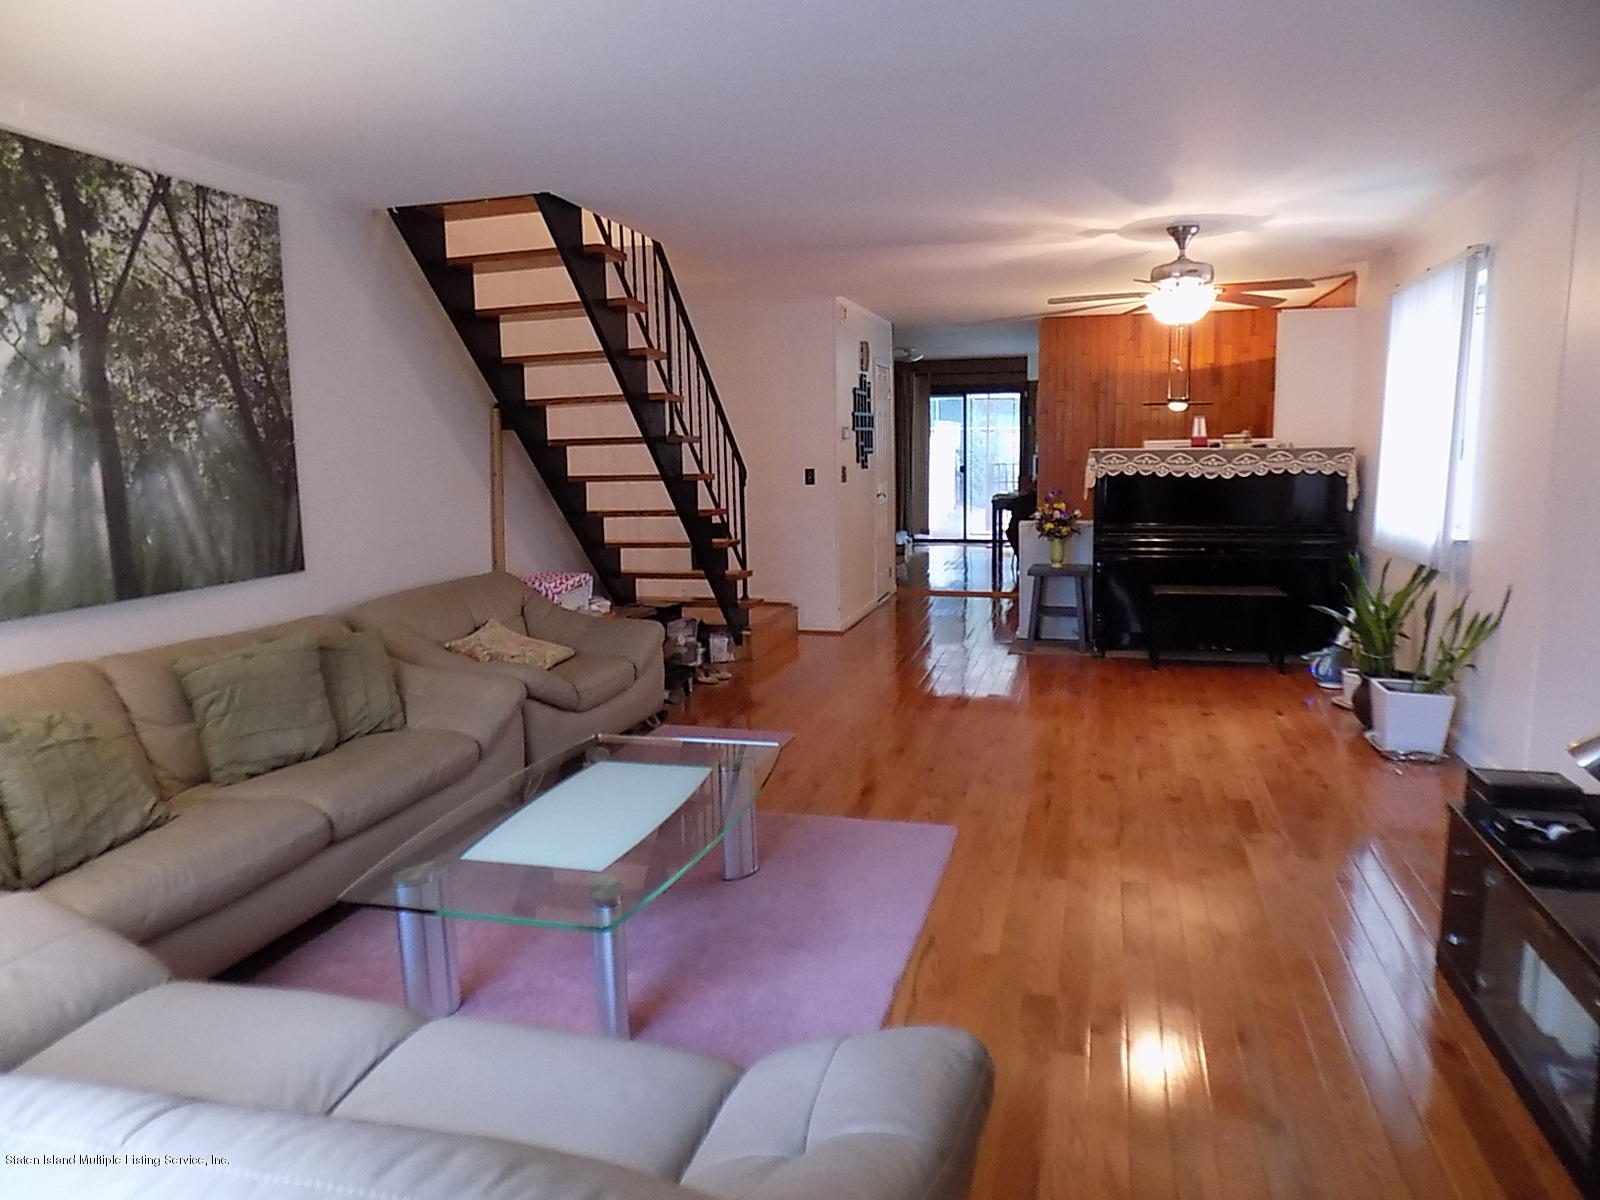 Single Family - Semi-Attached 85 Bogota Street  Staten Island, NY 10314, MLS-1126026-5